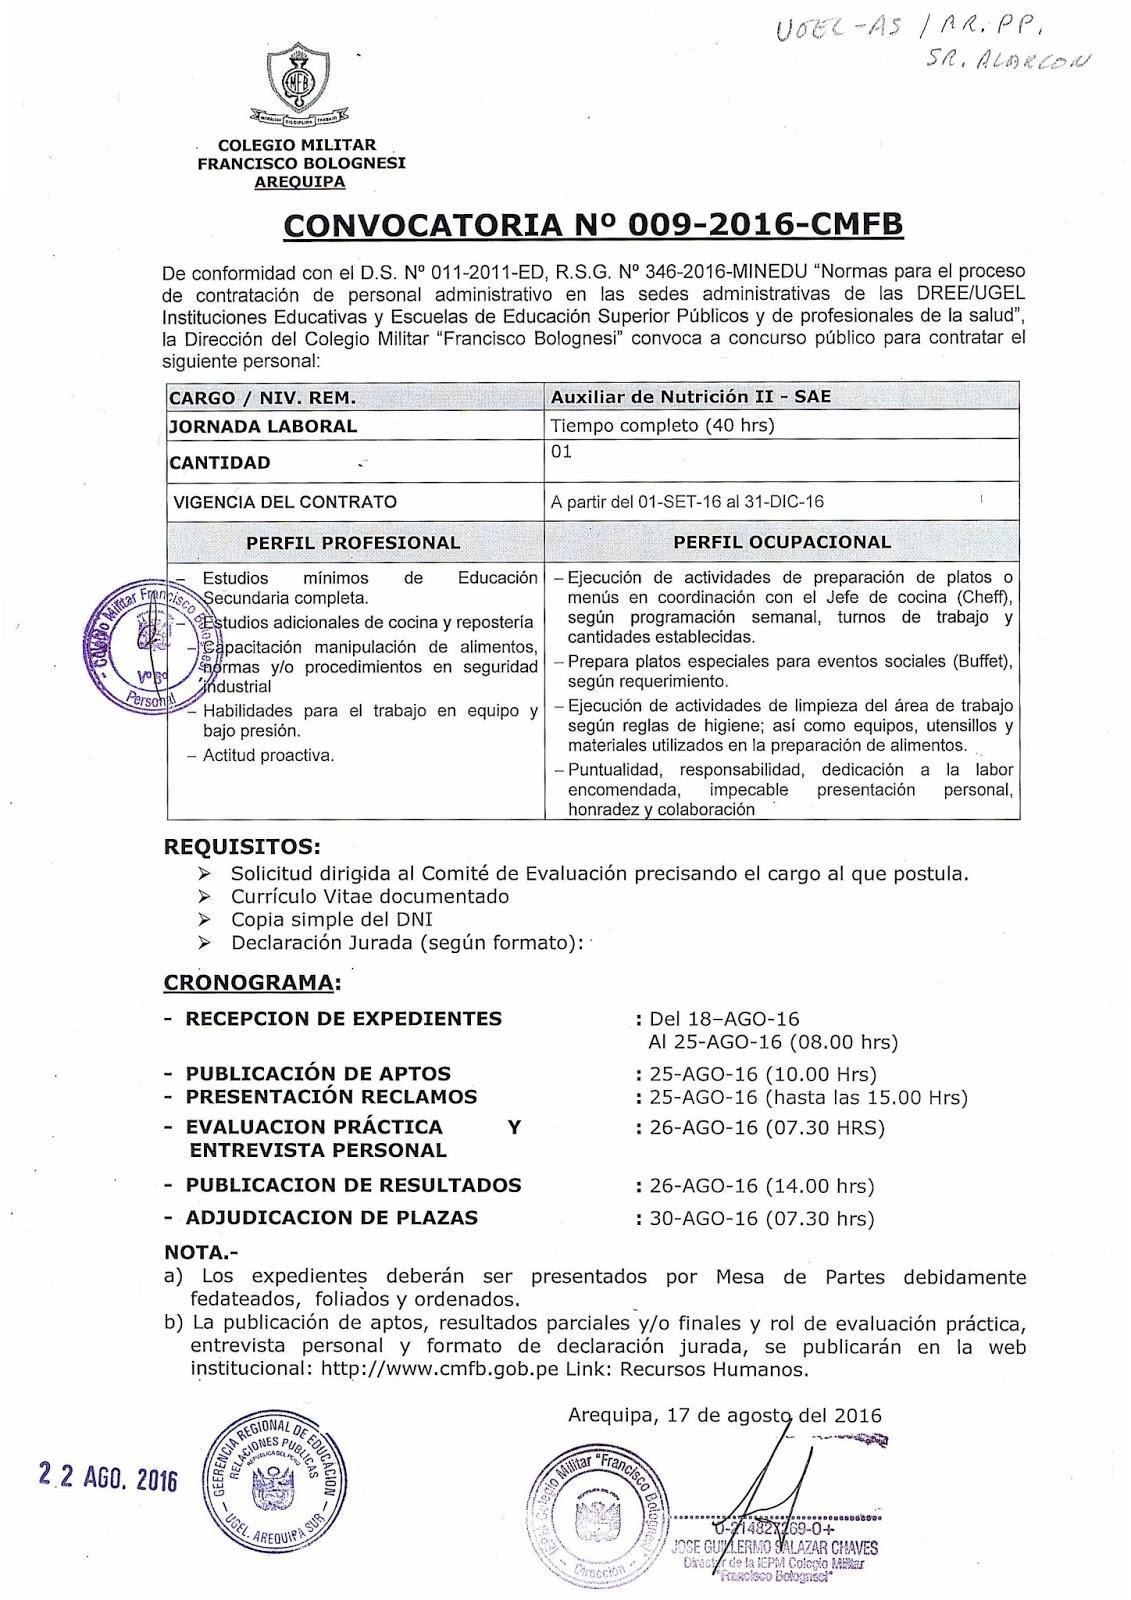 C m francisco bolognesi convoca a concurso p blico for Plazas concurso docente 2016